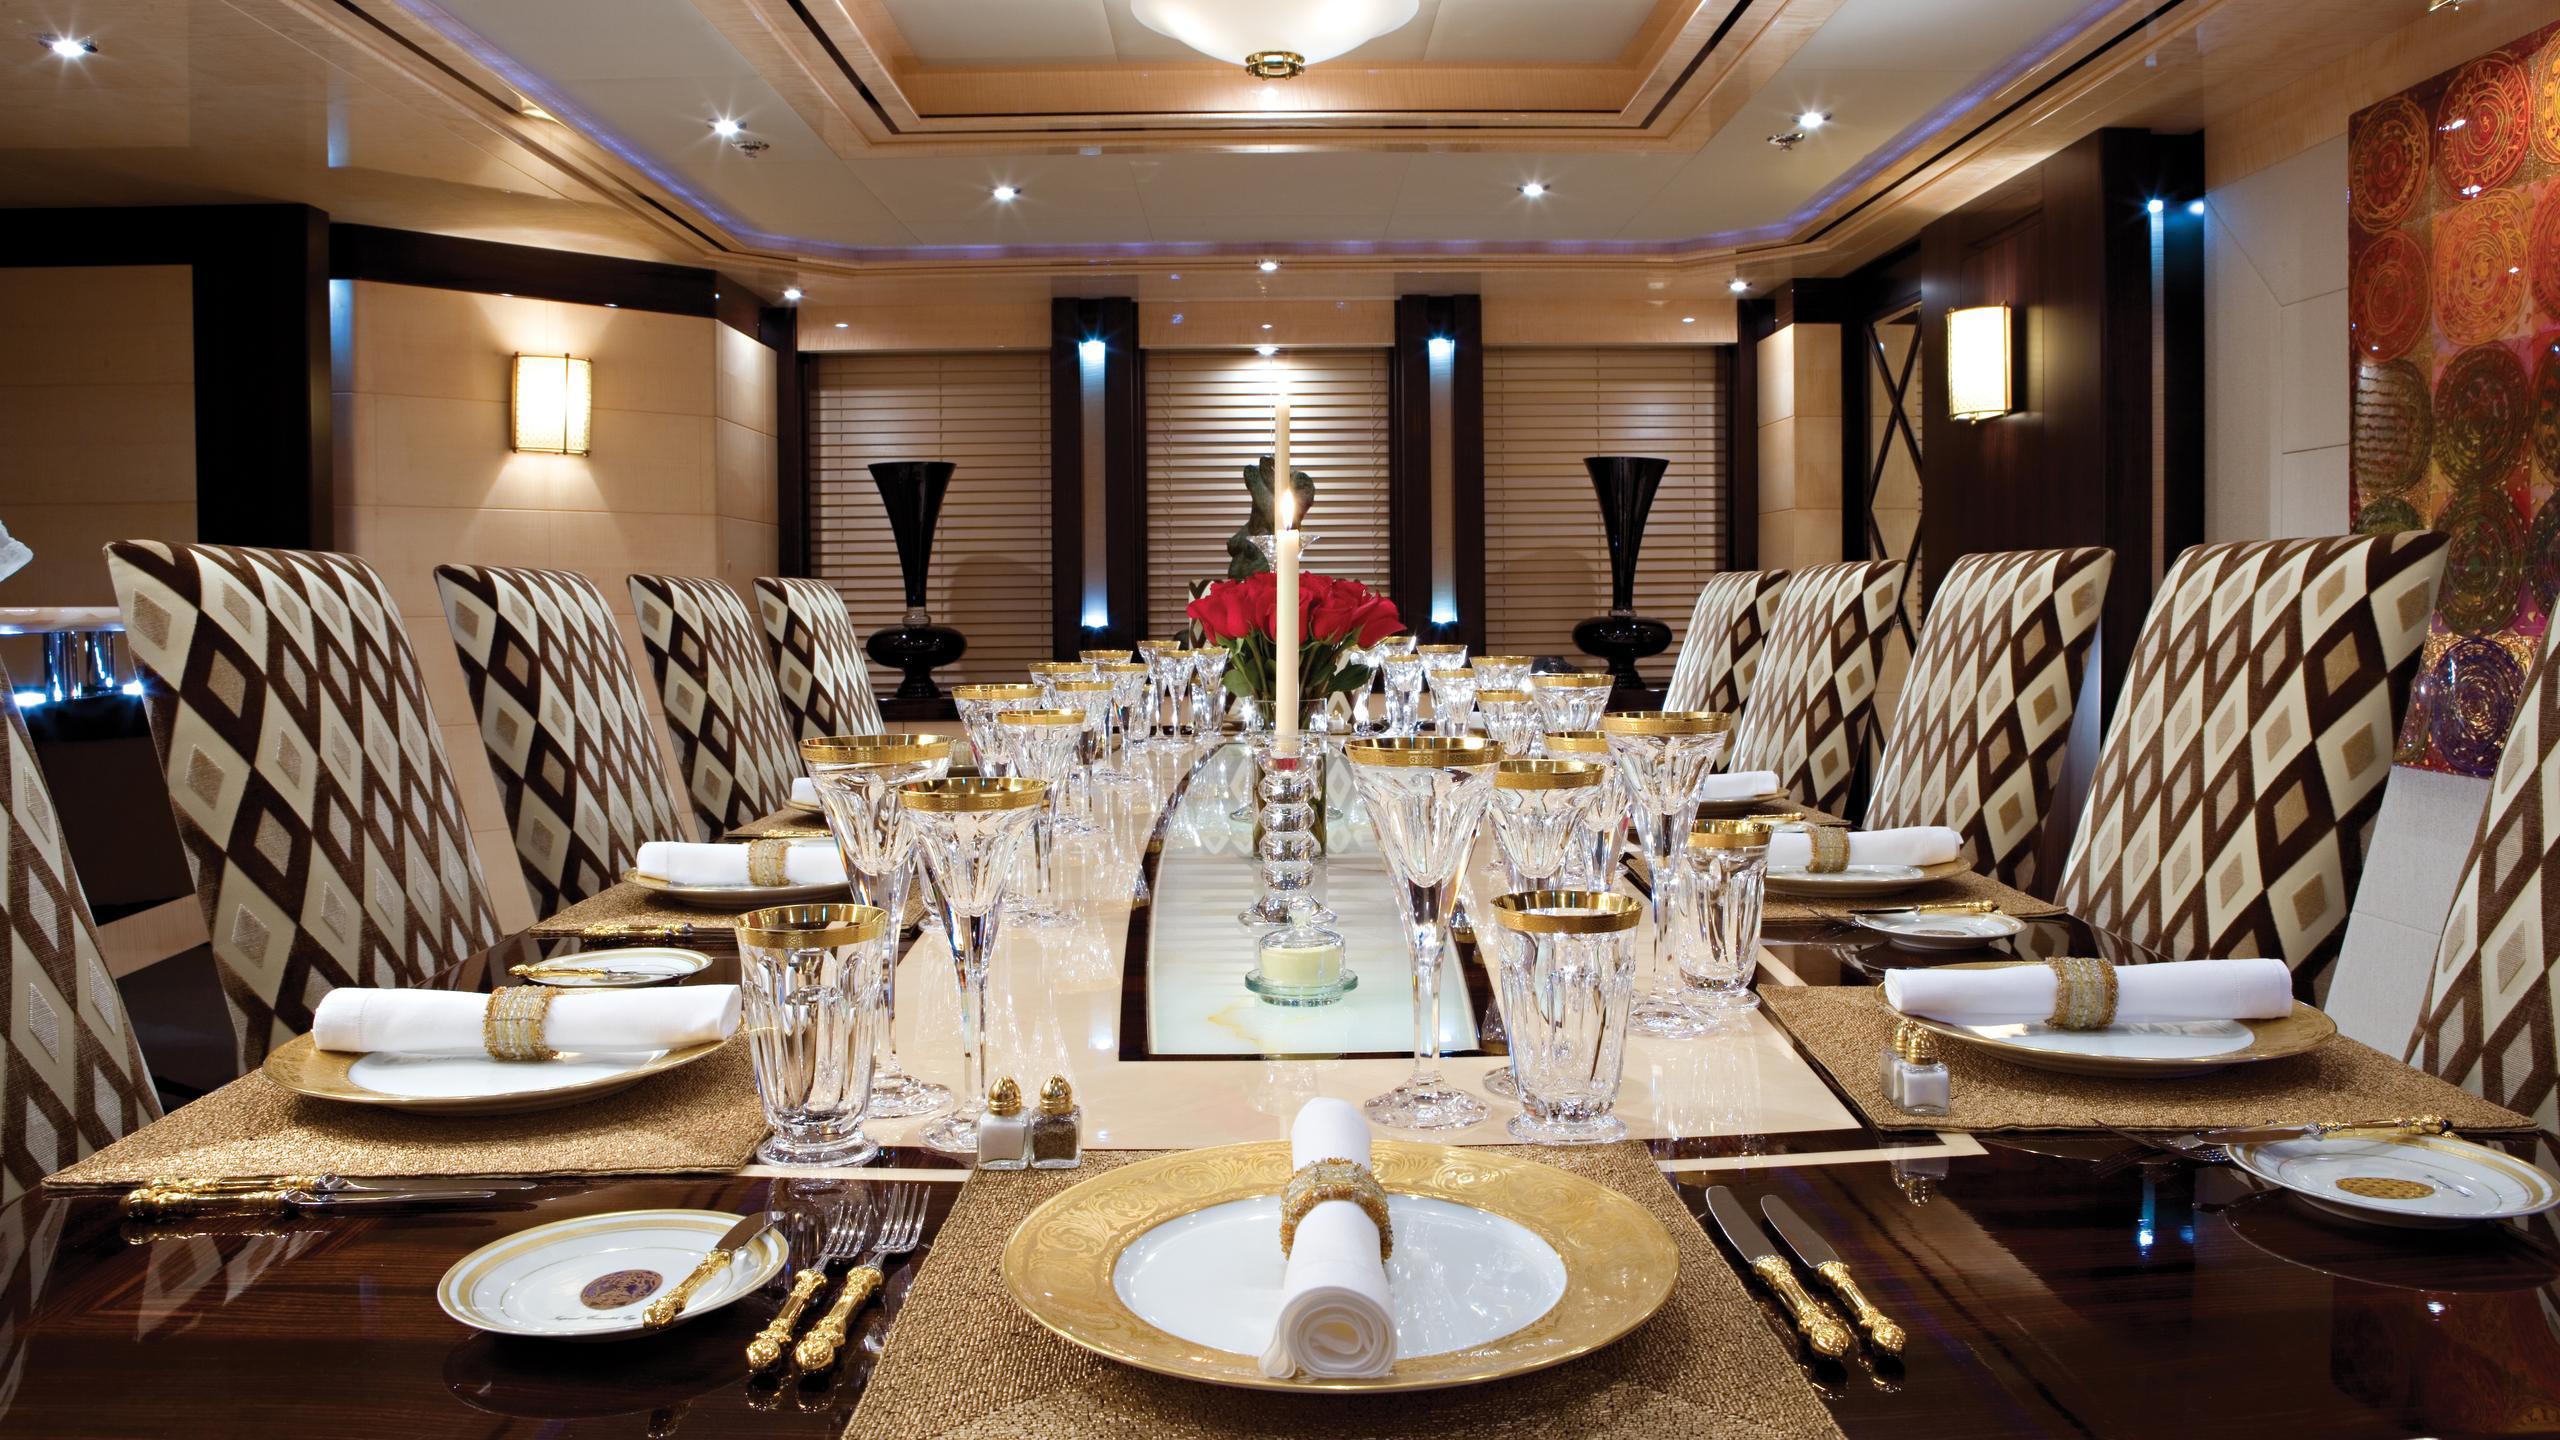 lady-sheridan-yacht-formal-dining